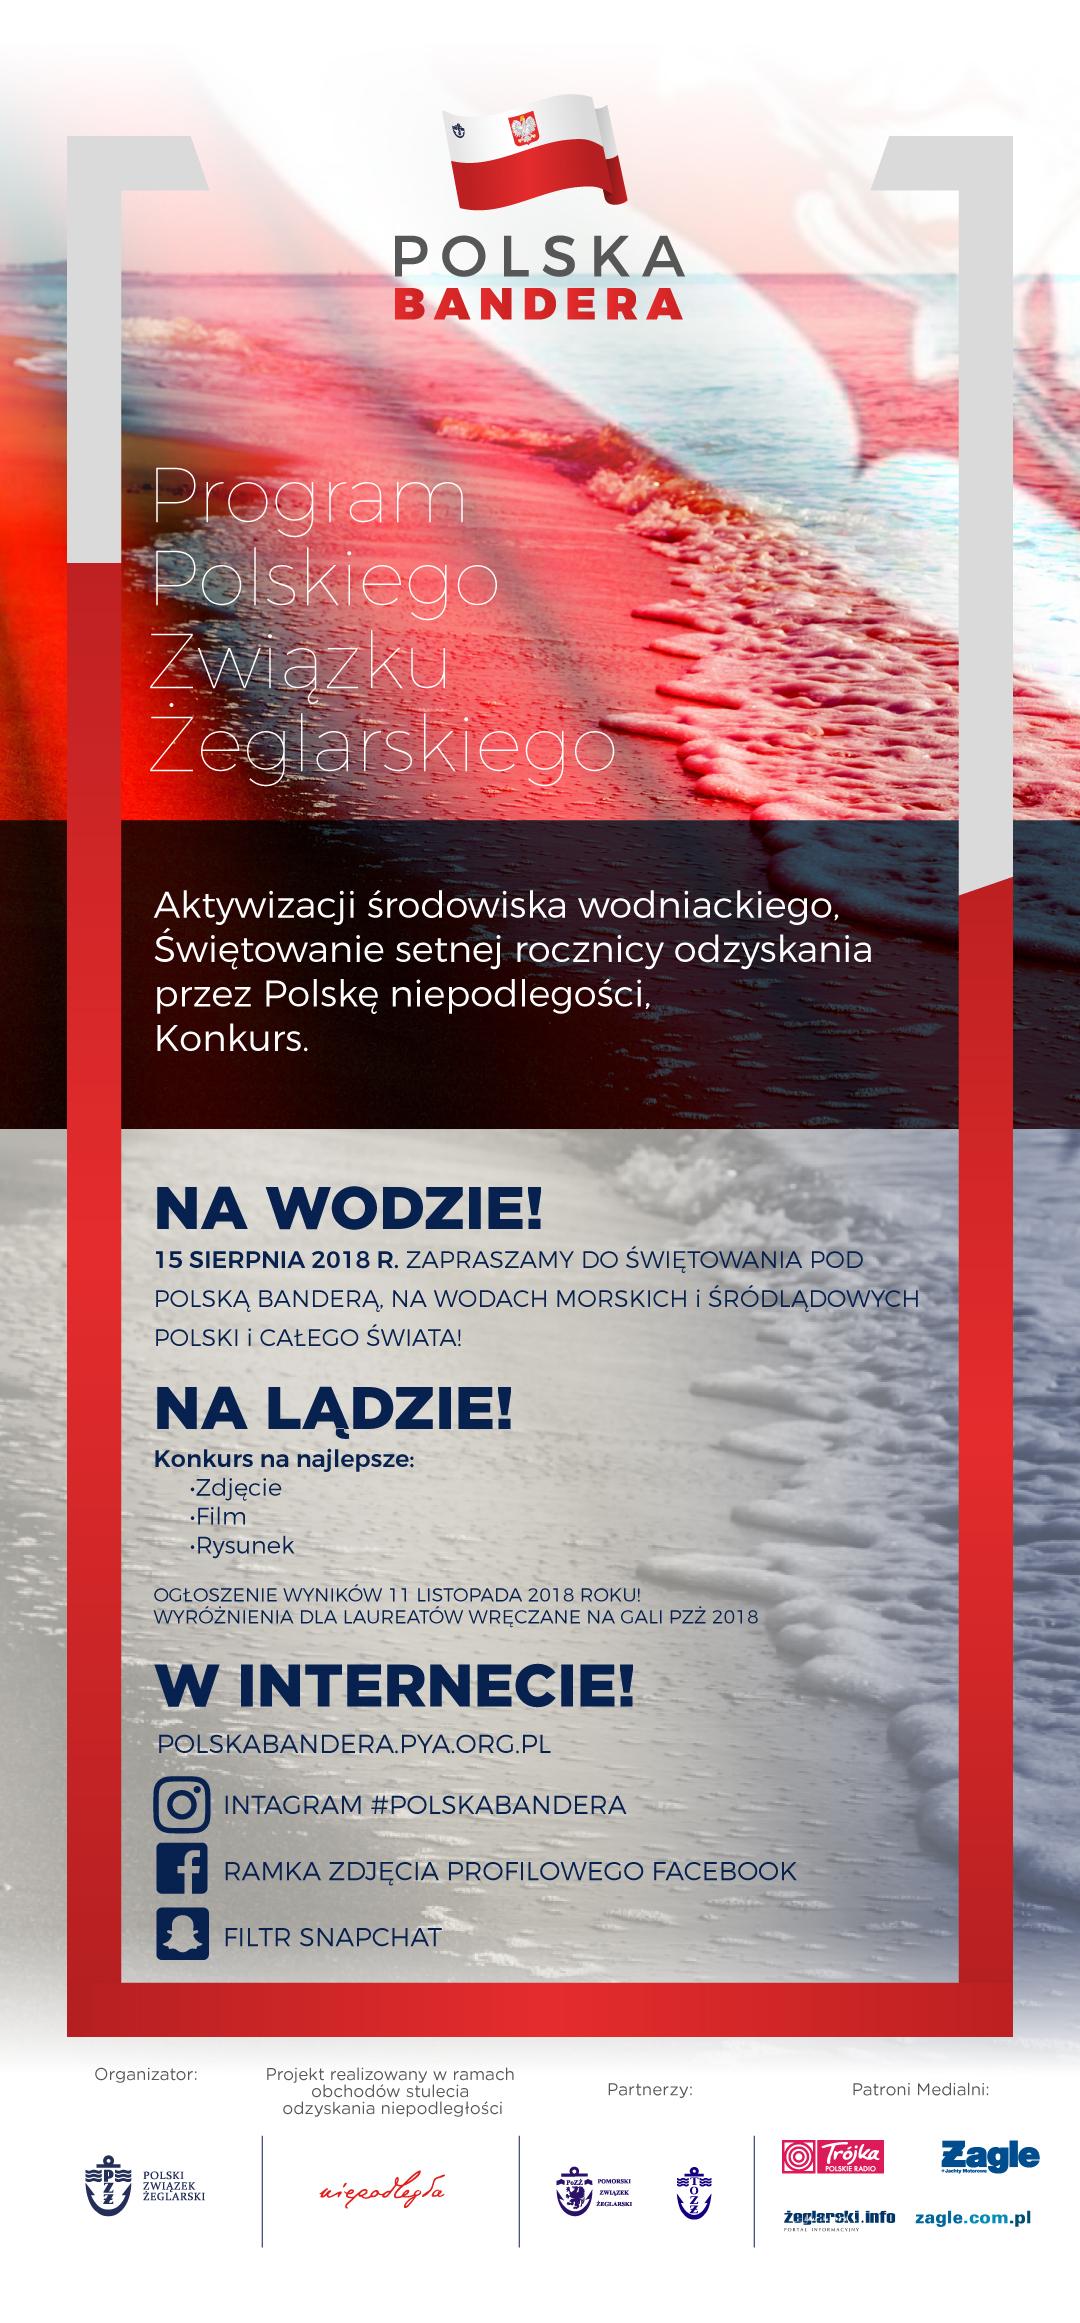 Baner programu Polska Bandera 2018